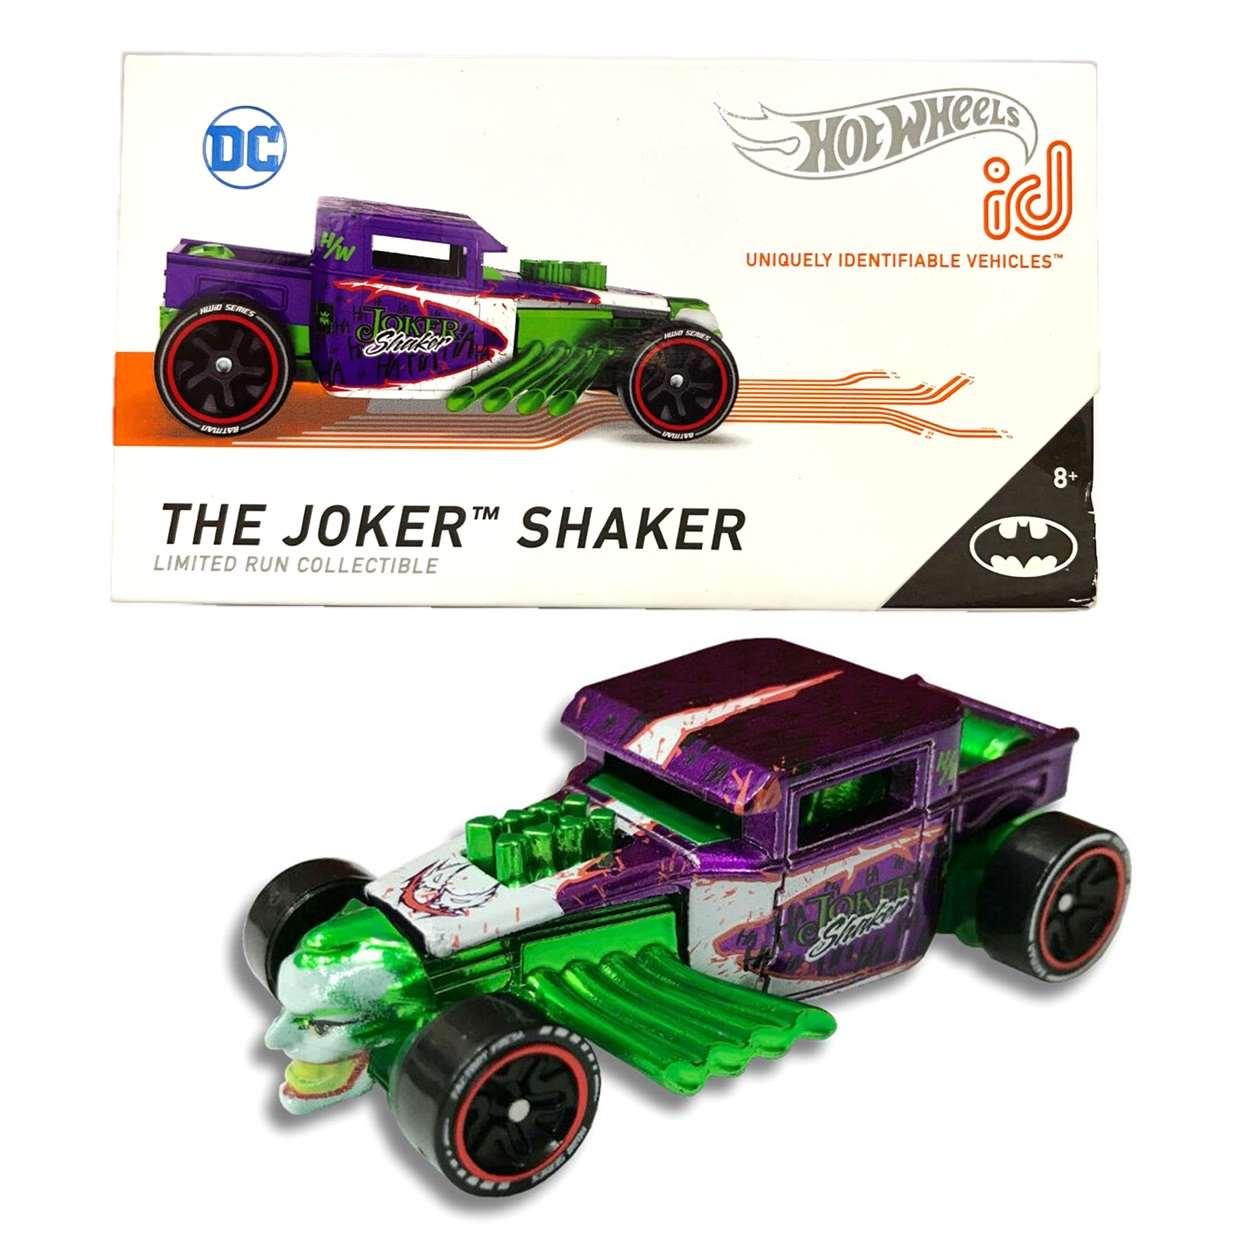 The Joker Shaker Hot Wheels Dc Comics ID